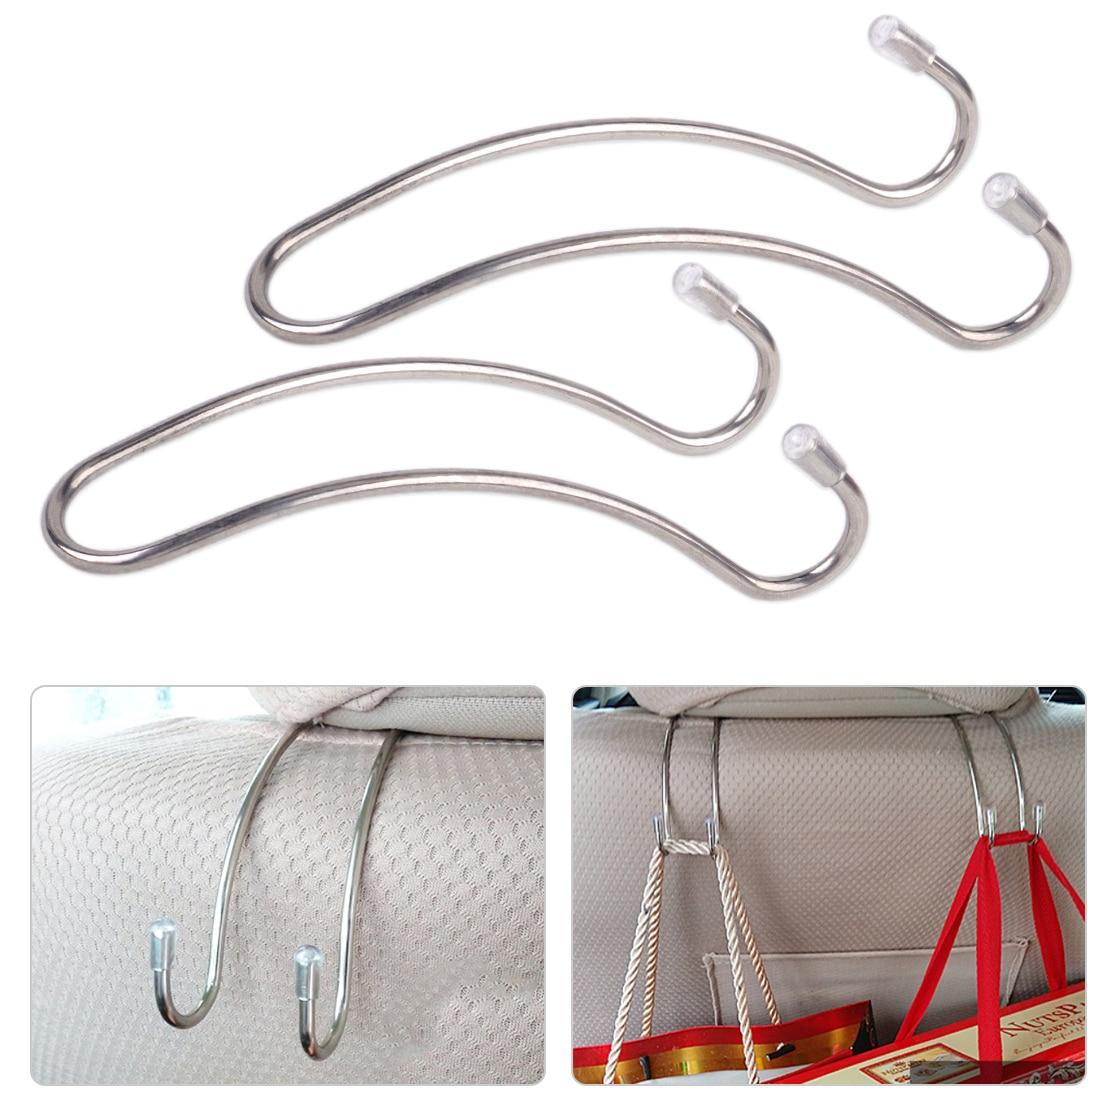 Automobiles & Motorcycles Interior Accessories Dwcx 2pcs Beige Fashion Portable Car Auto Seat Hanger Purse Bag Organizer Holder Hook Headrest For Vw Audi Ford Kia Hyundai